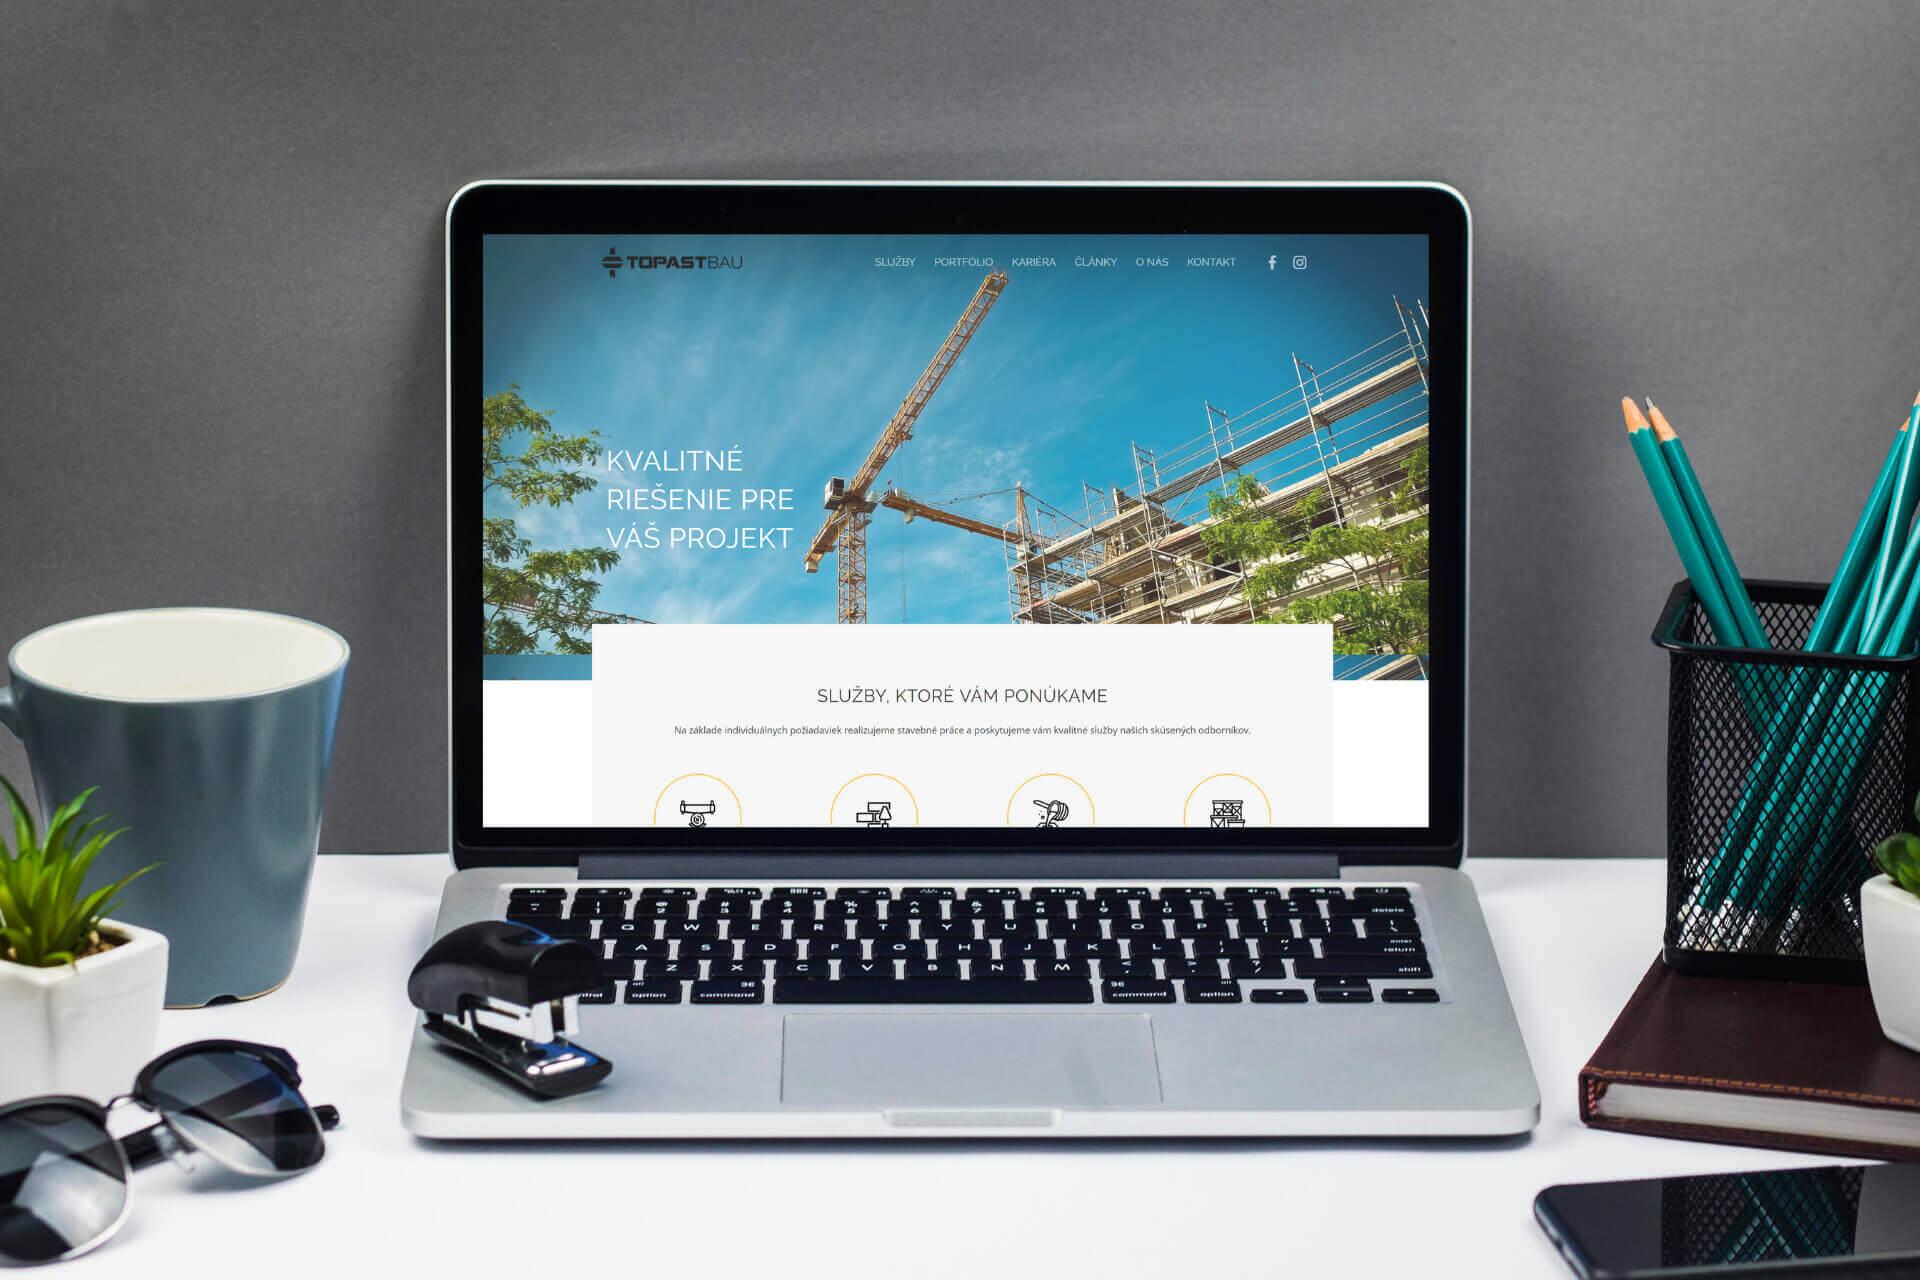 tvorba-web-stranok-ludmila-hoosova-stavebna-firma-topastbau